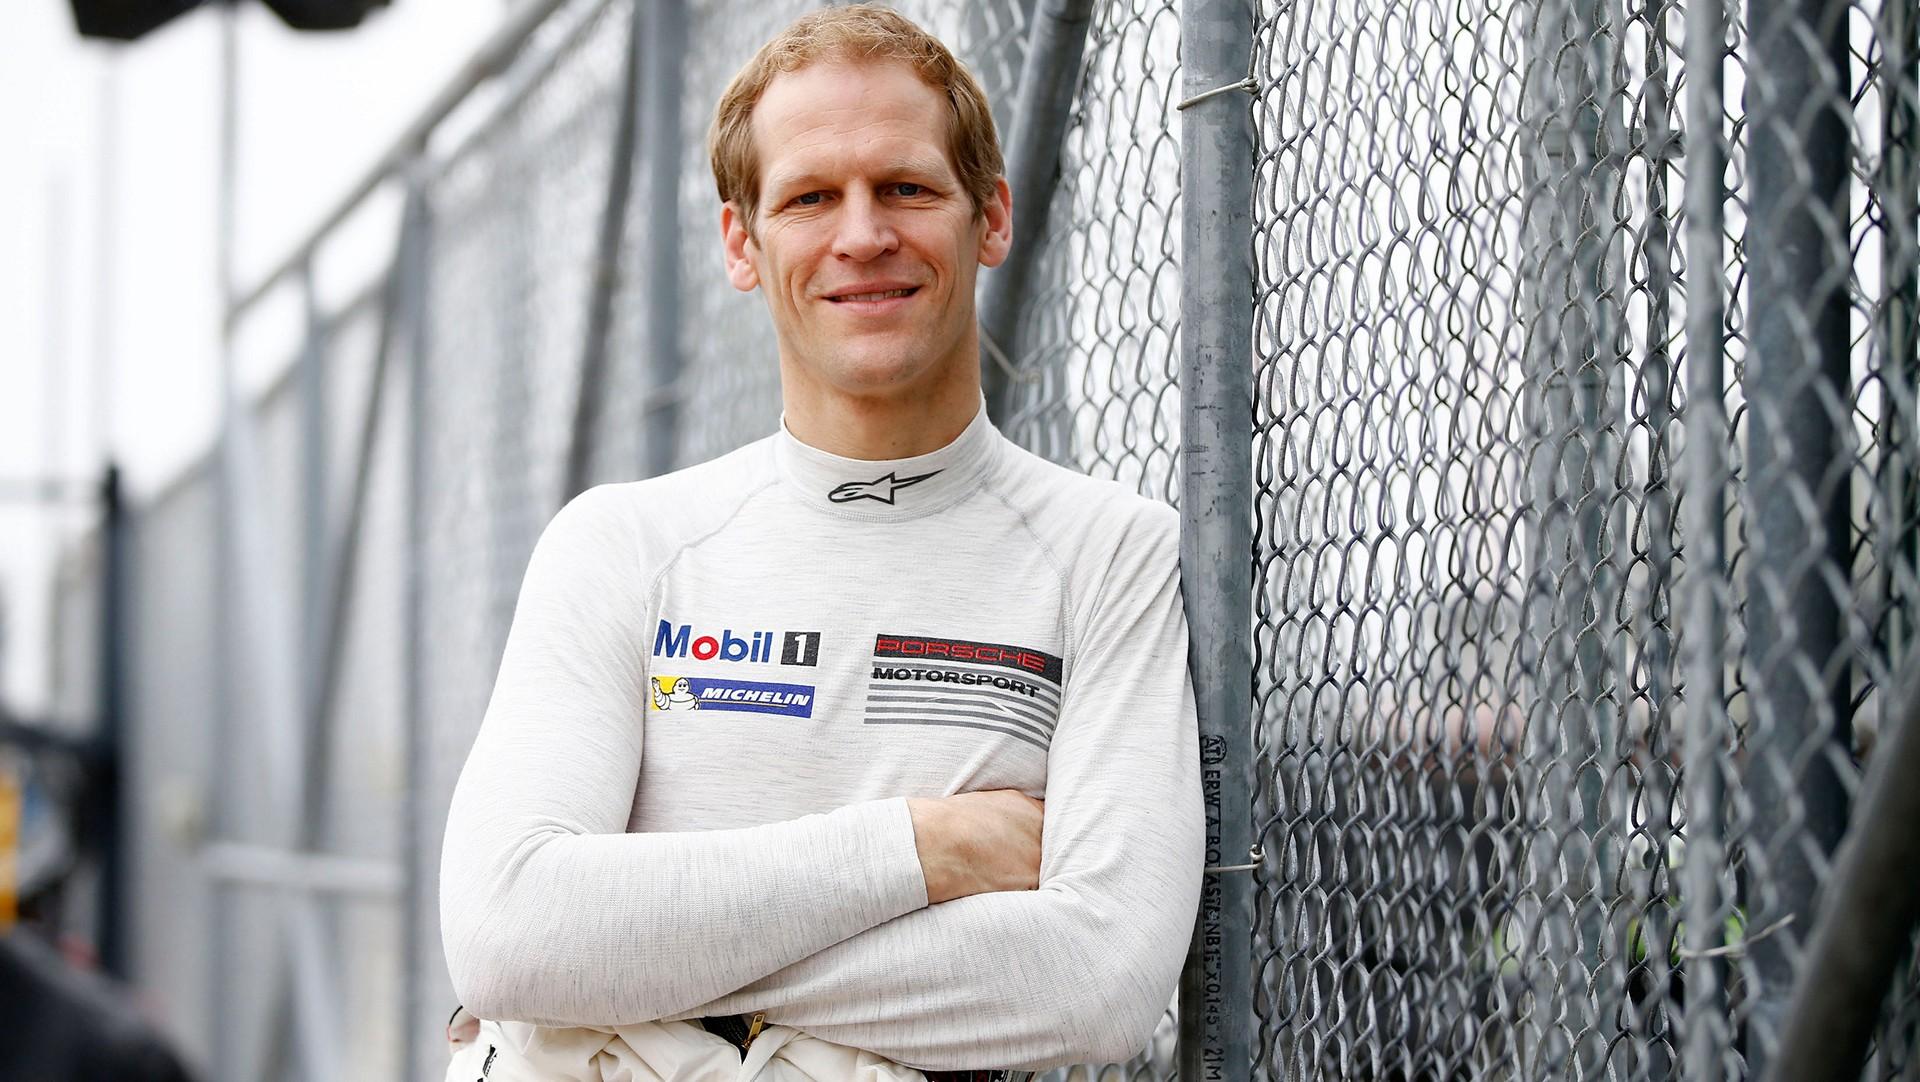 Jörg Bergmeister, Daytona, IMSA WeatherTech SportsCar Championship © Dr. Ing. h.c. F. Porsche AG